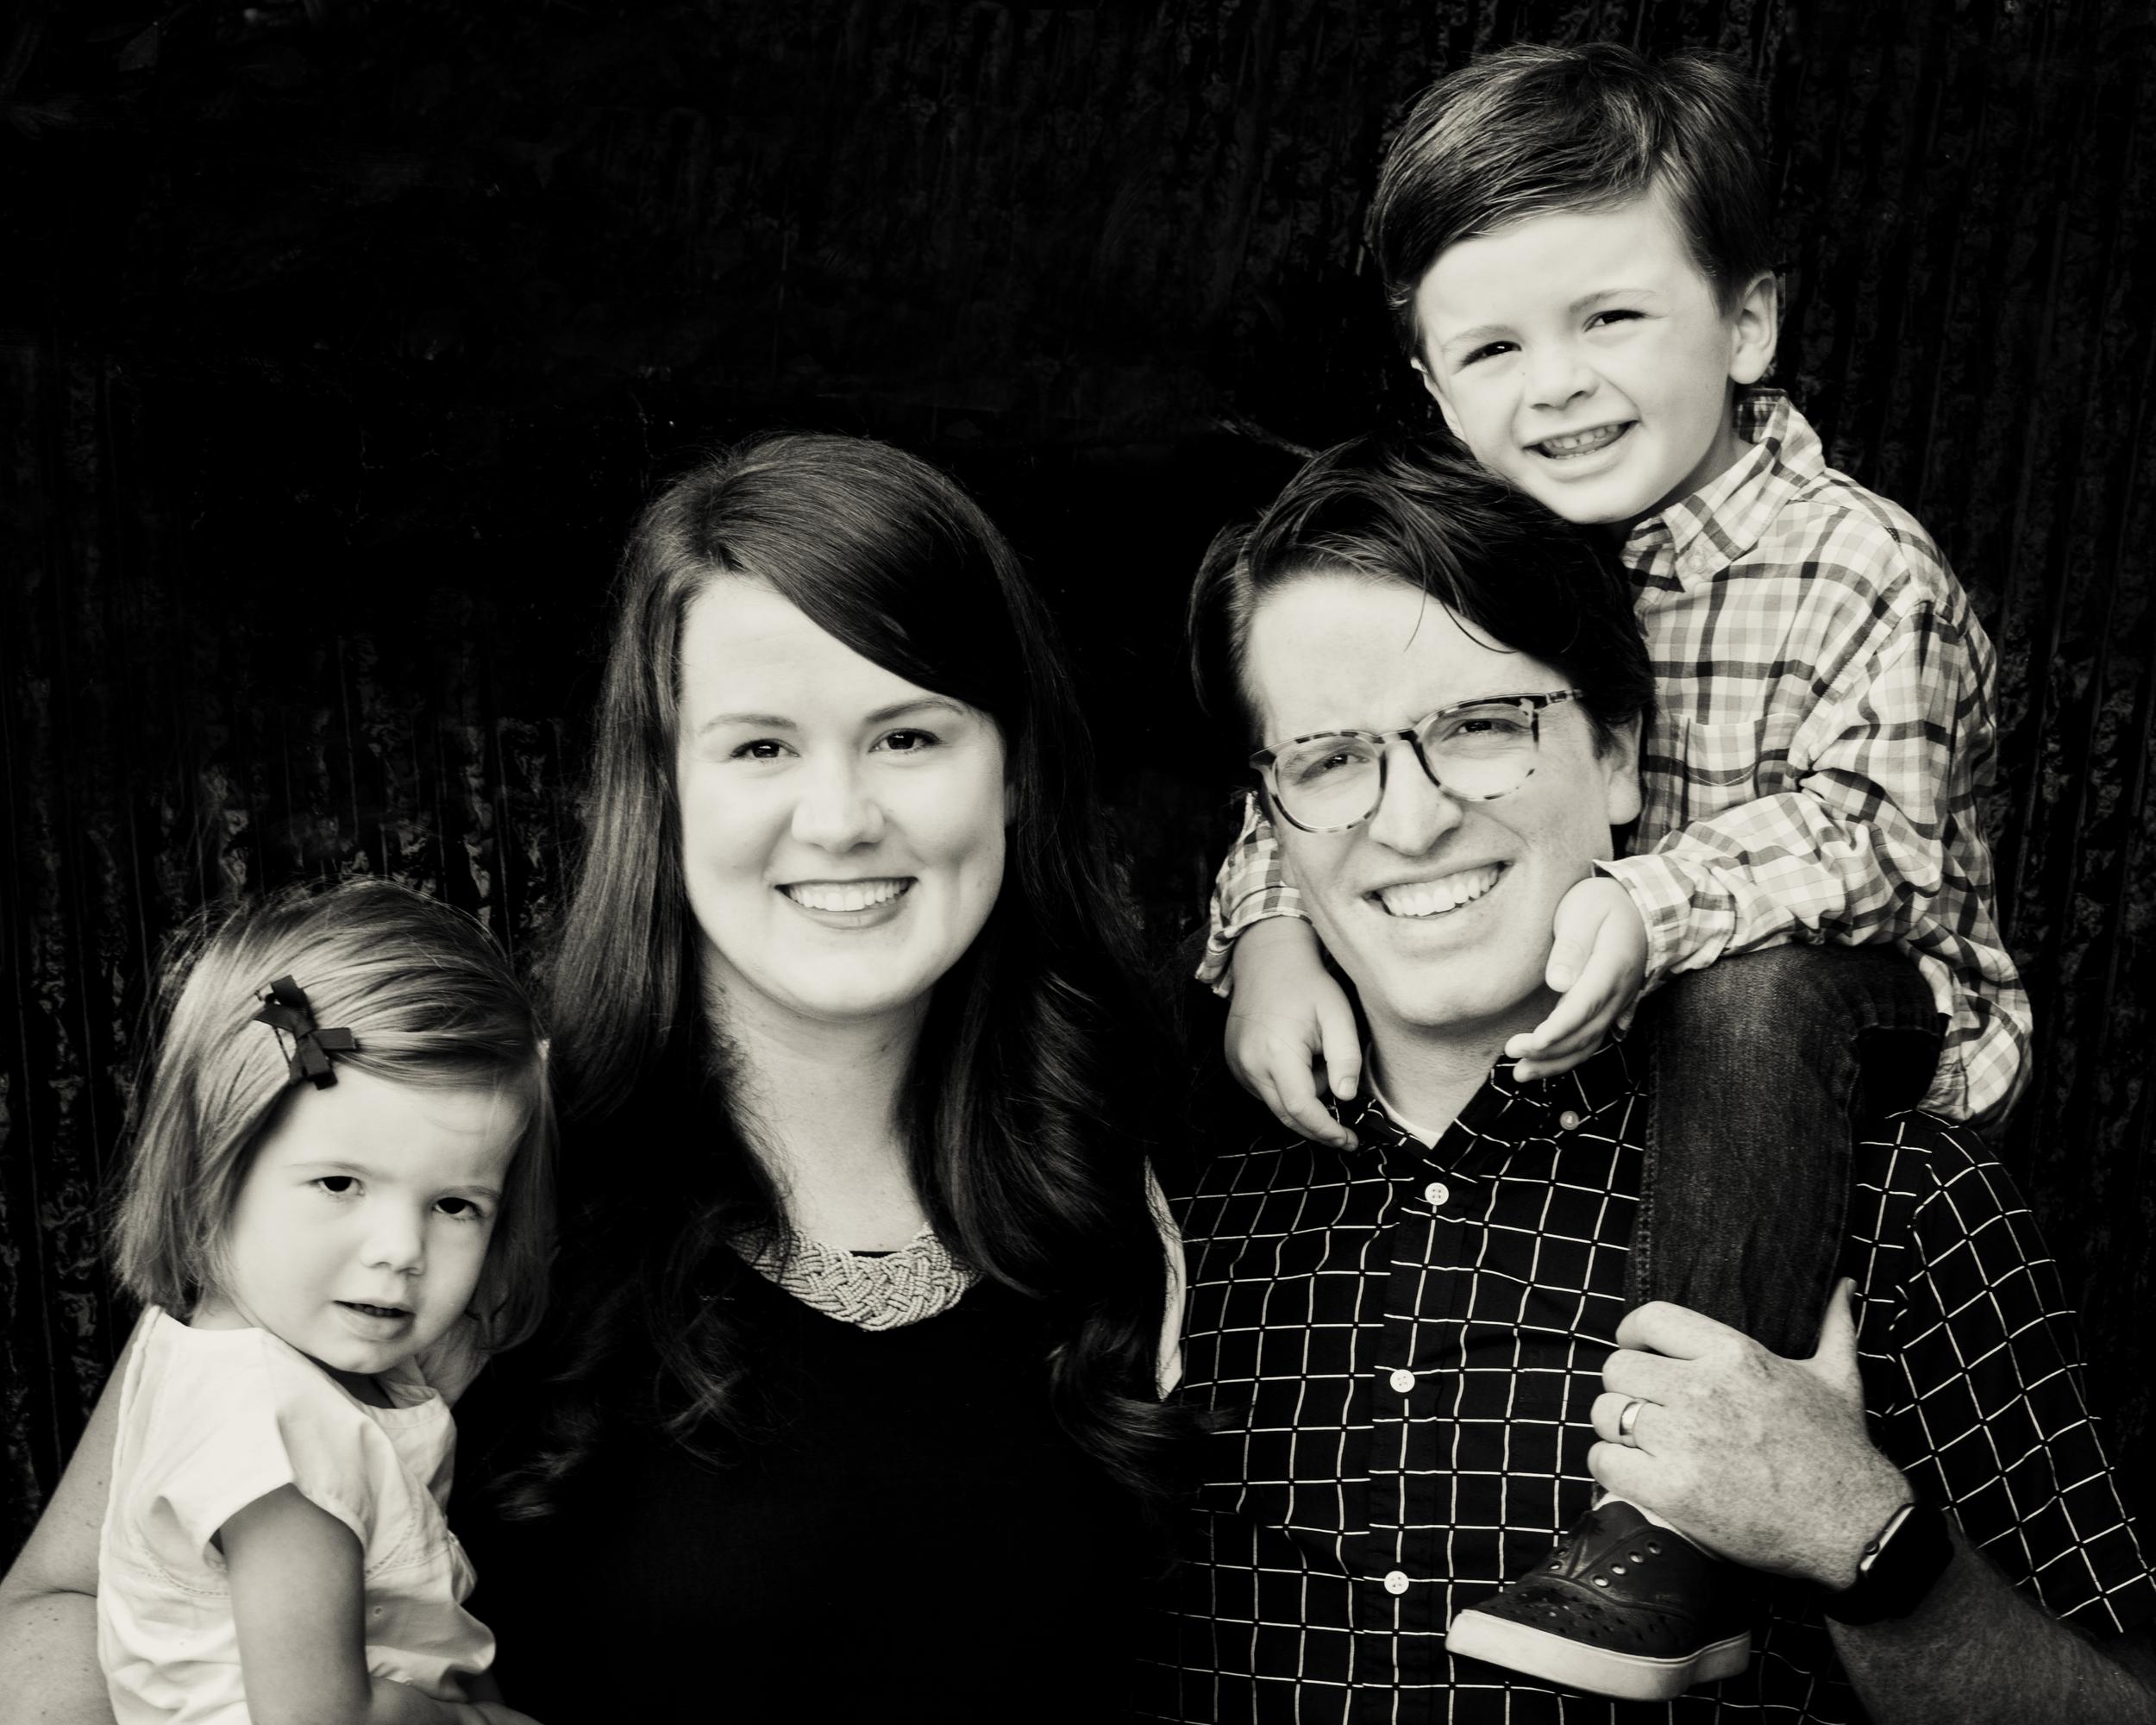 McKinnon Reunion-Meredith Family 8x10 Platinum.jpg